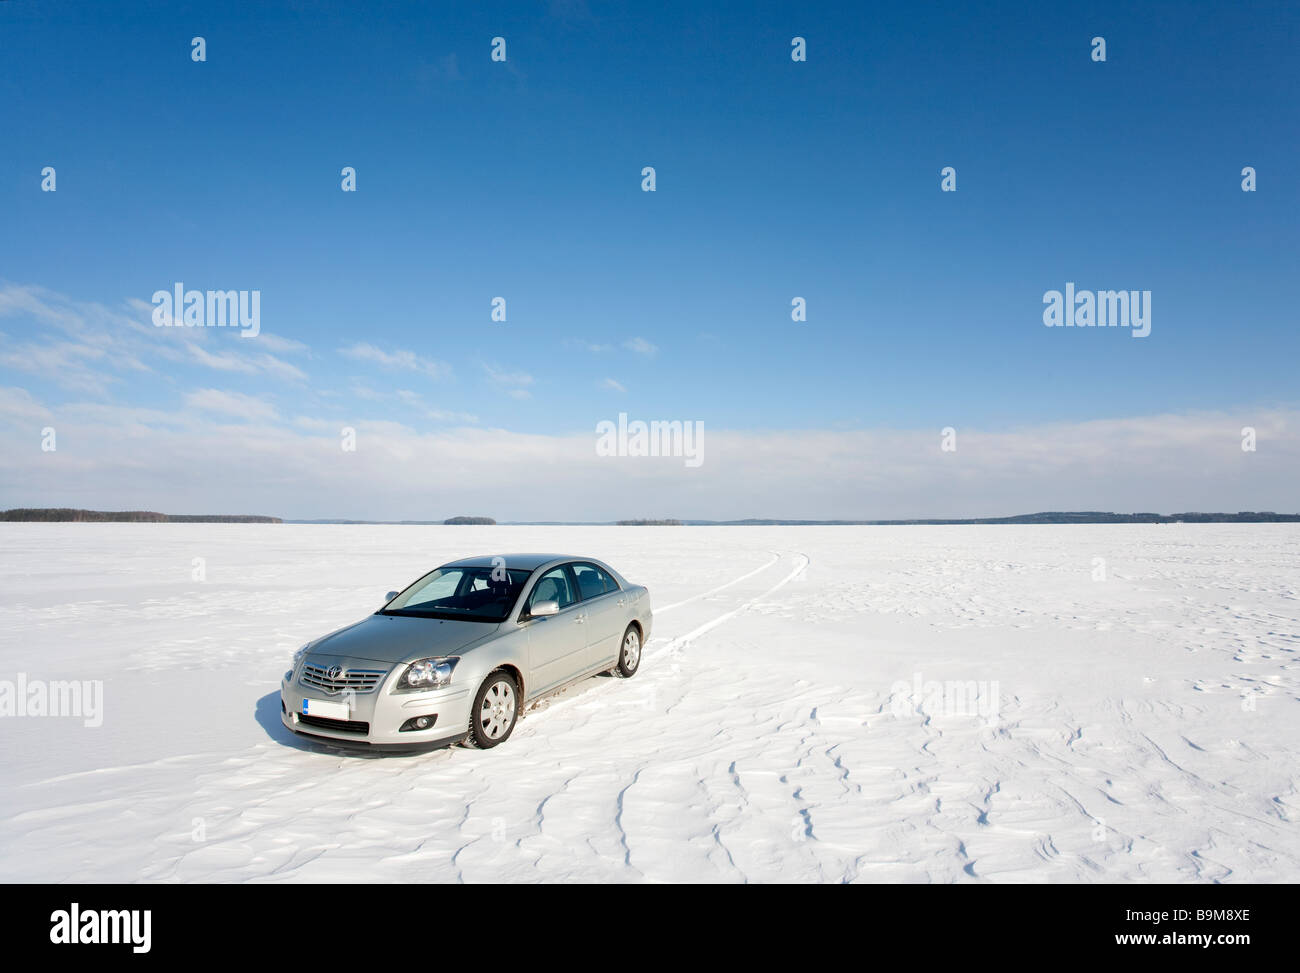 Toyota Avensis 2007 on lake Keitele ice , Finland - Stock Image